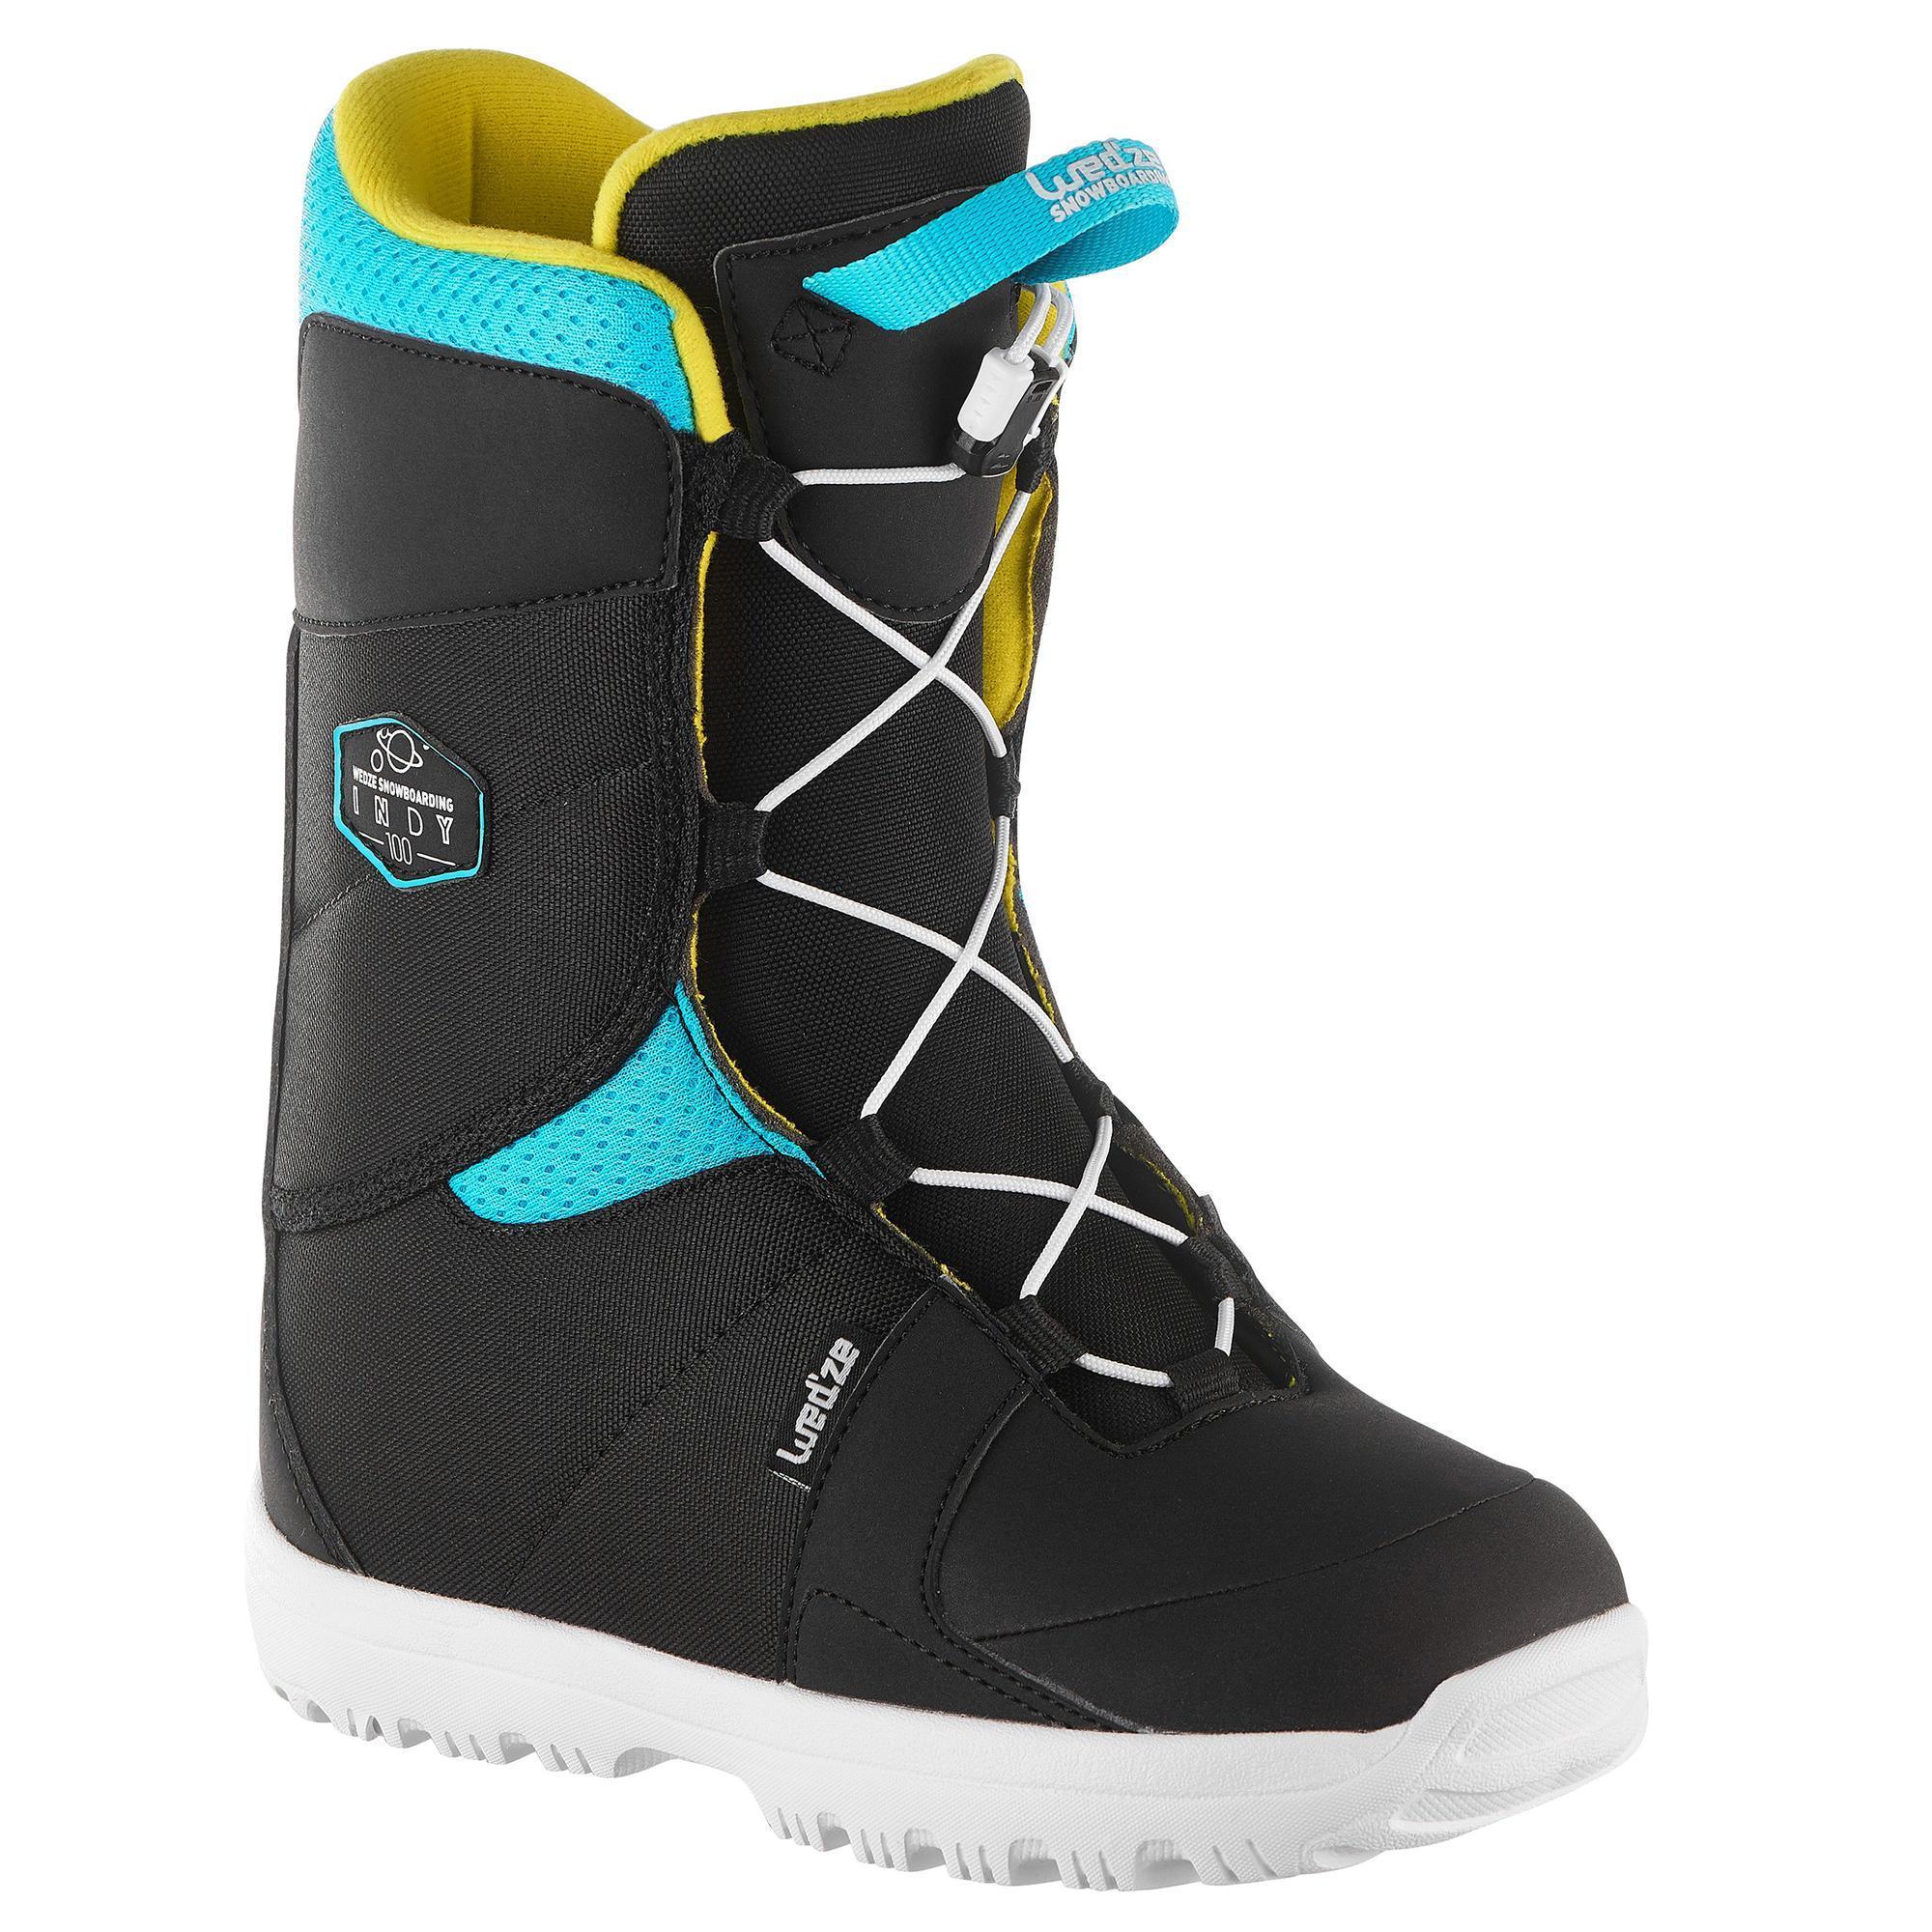 Jungen,Kinder,Kinder Snowboardschuhe Fast Lock Indy 100 Kinder (Größen 30-33)blau gelb | 03608449879514